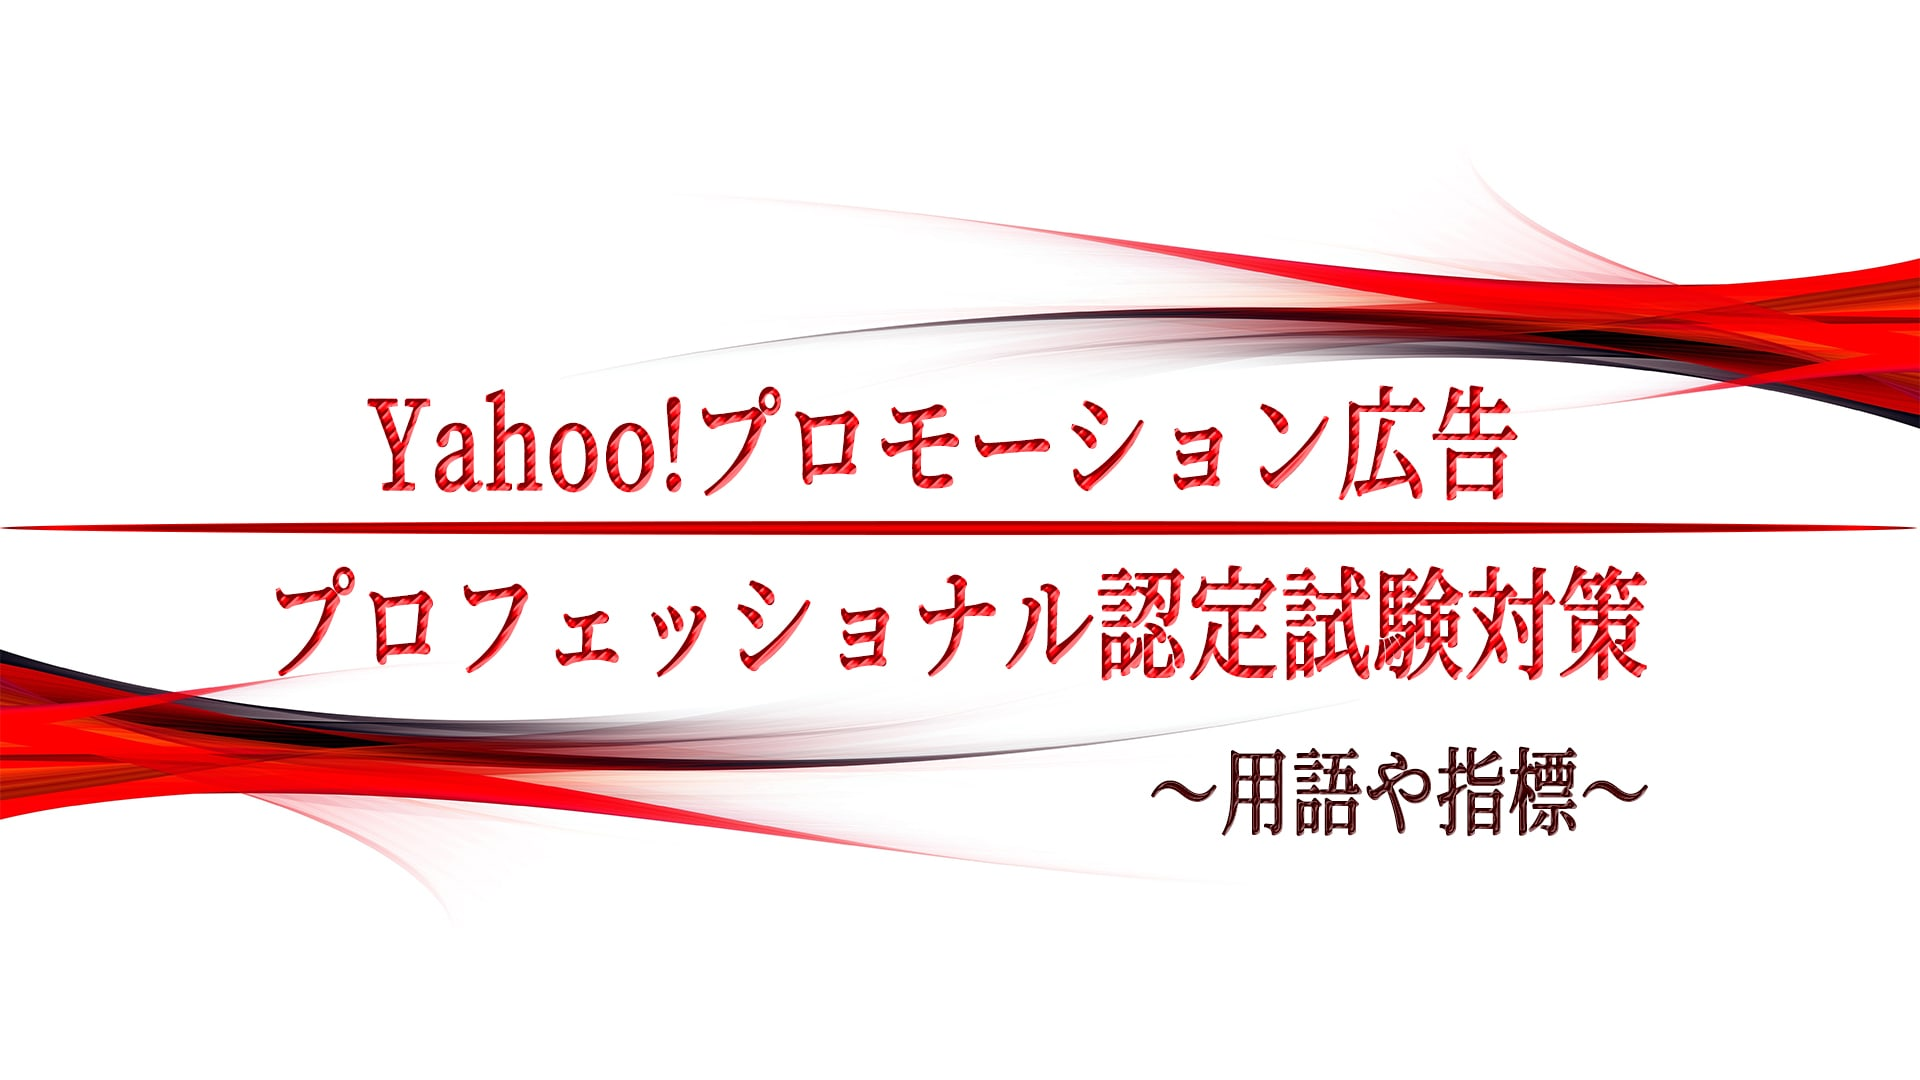 Yahoo!プロモーション広告プロフェッショナル認定試験対策〜用語や指標〜